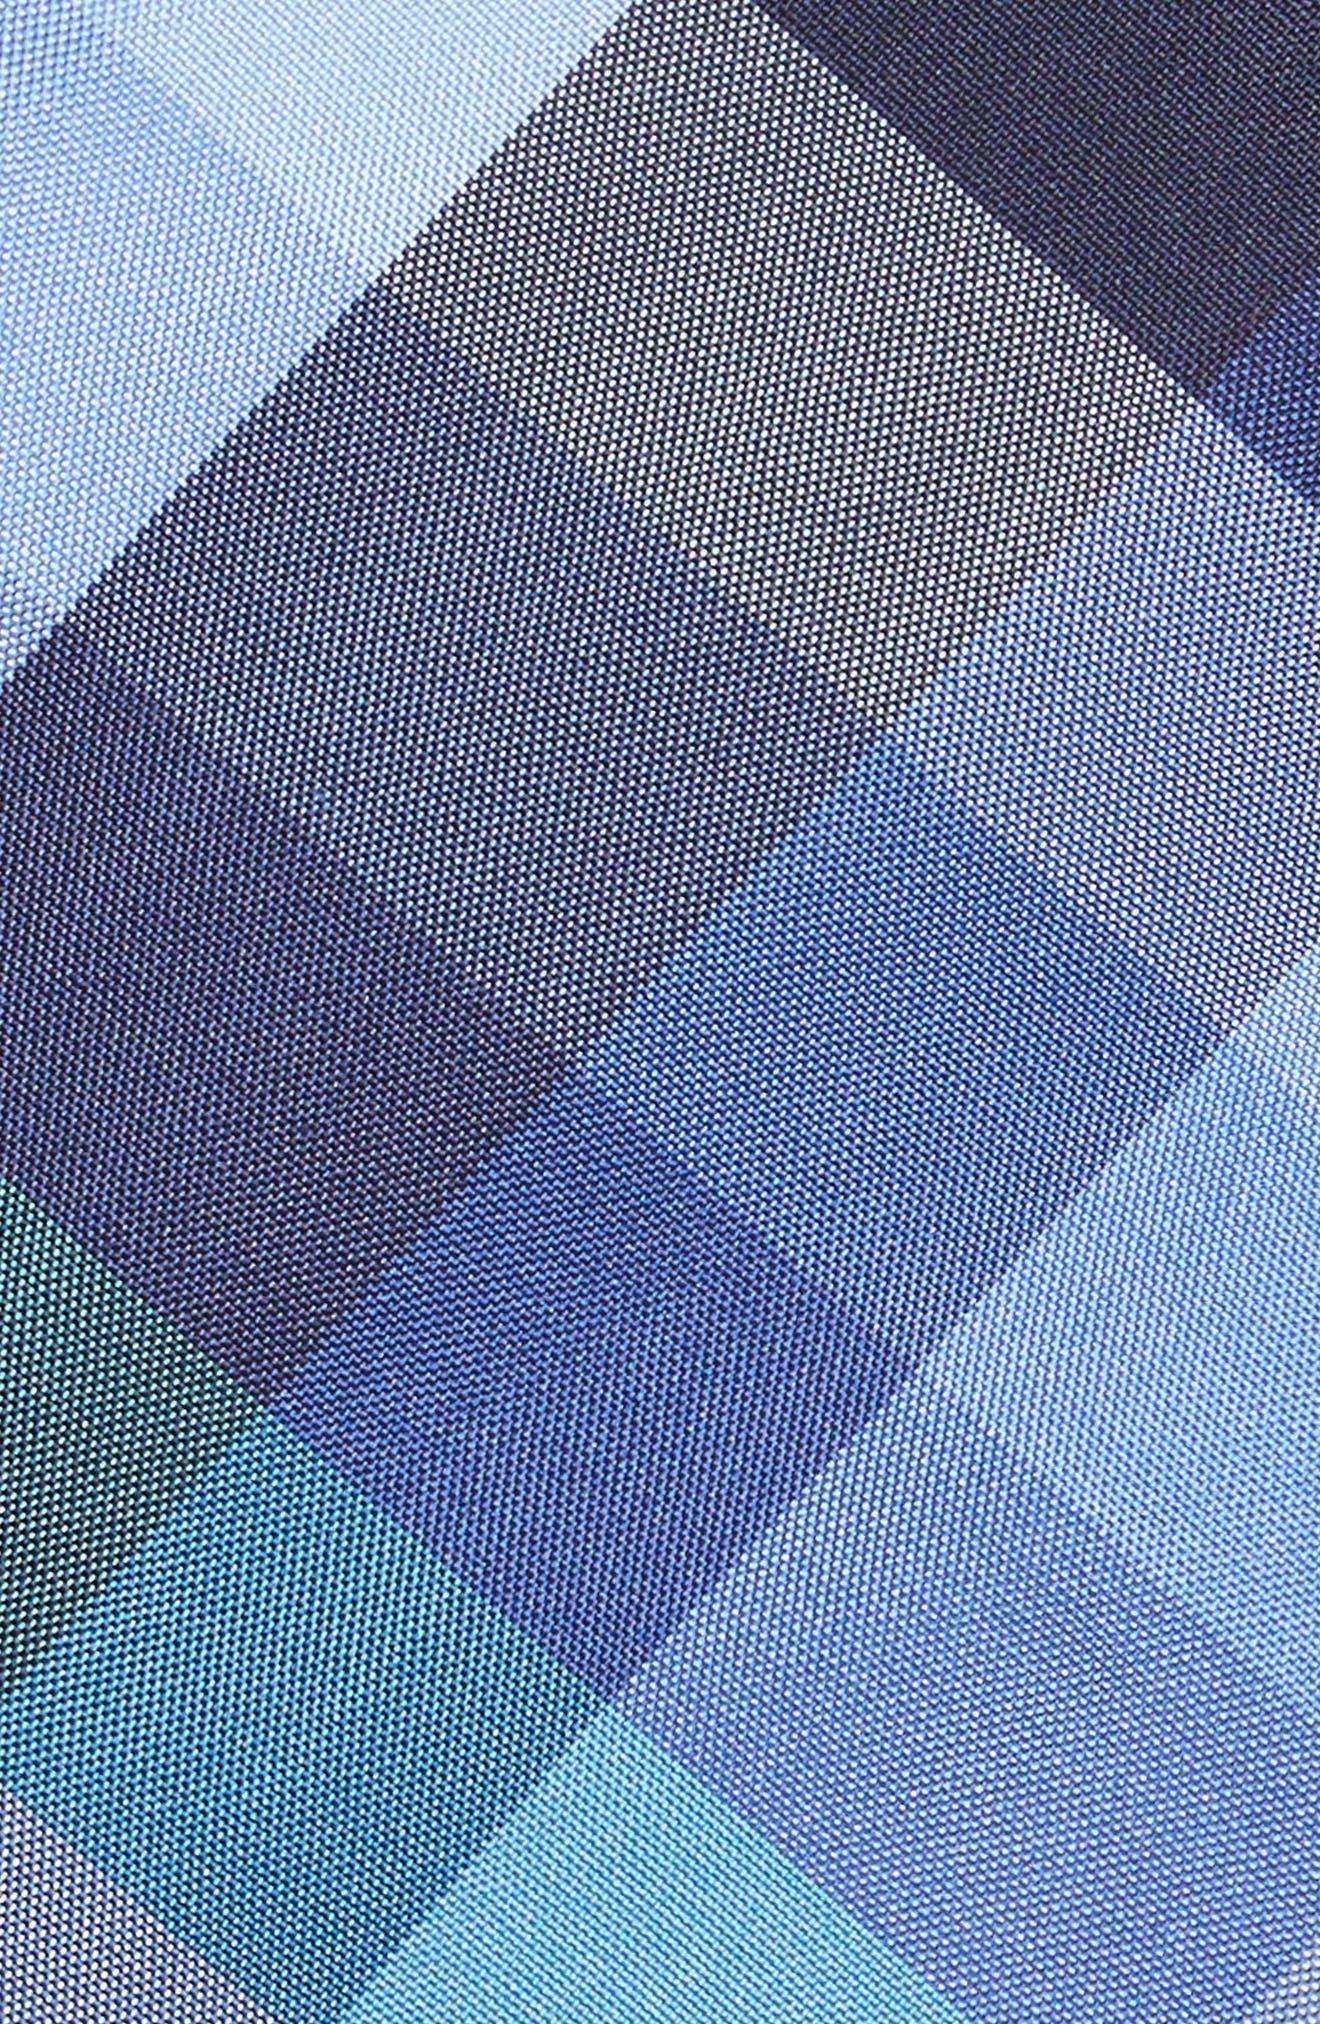 Autumn Check Silk Skinny Tie,                             Alternate thumbnail 2, color,                             Navy